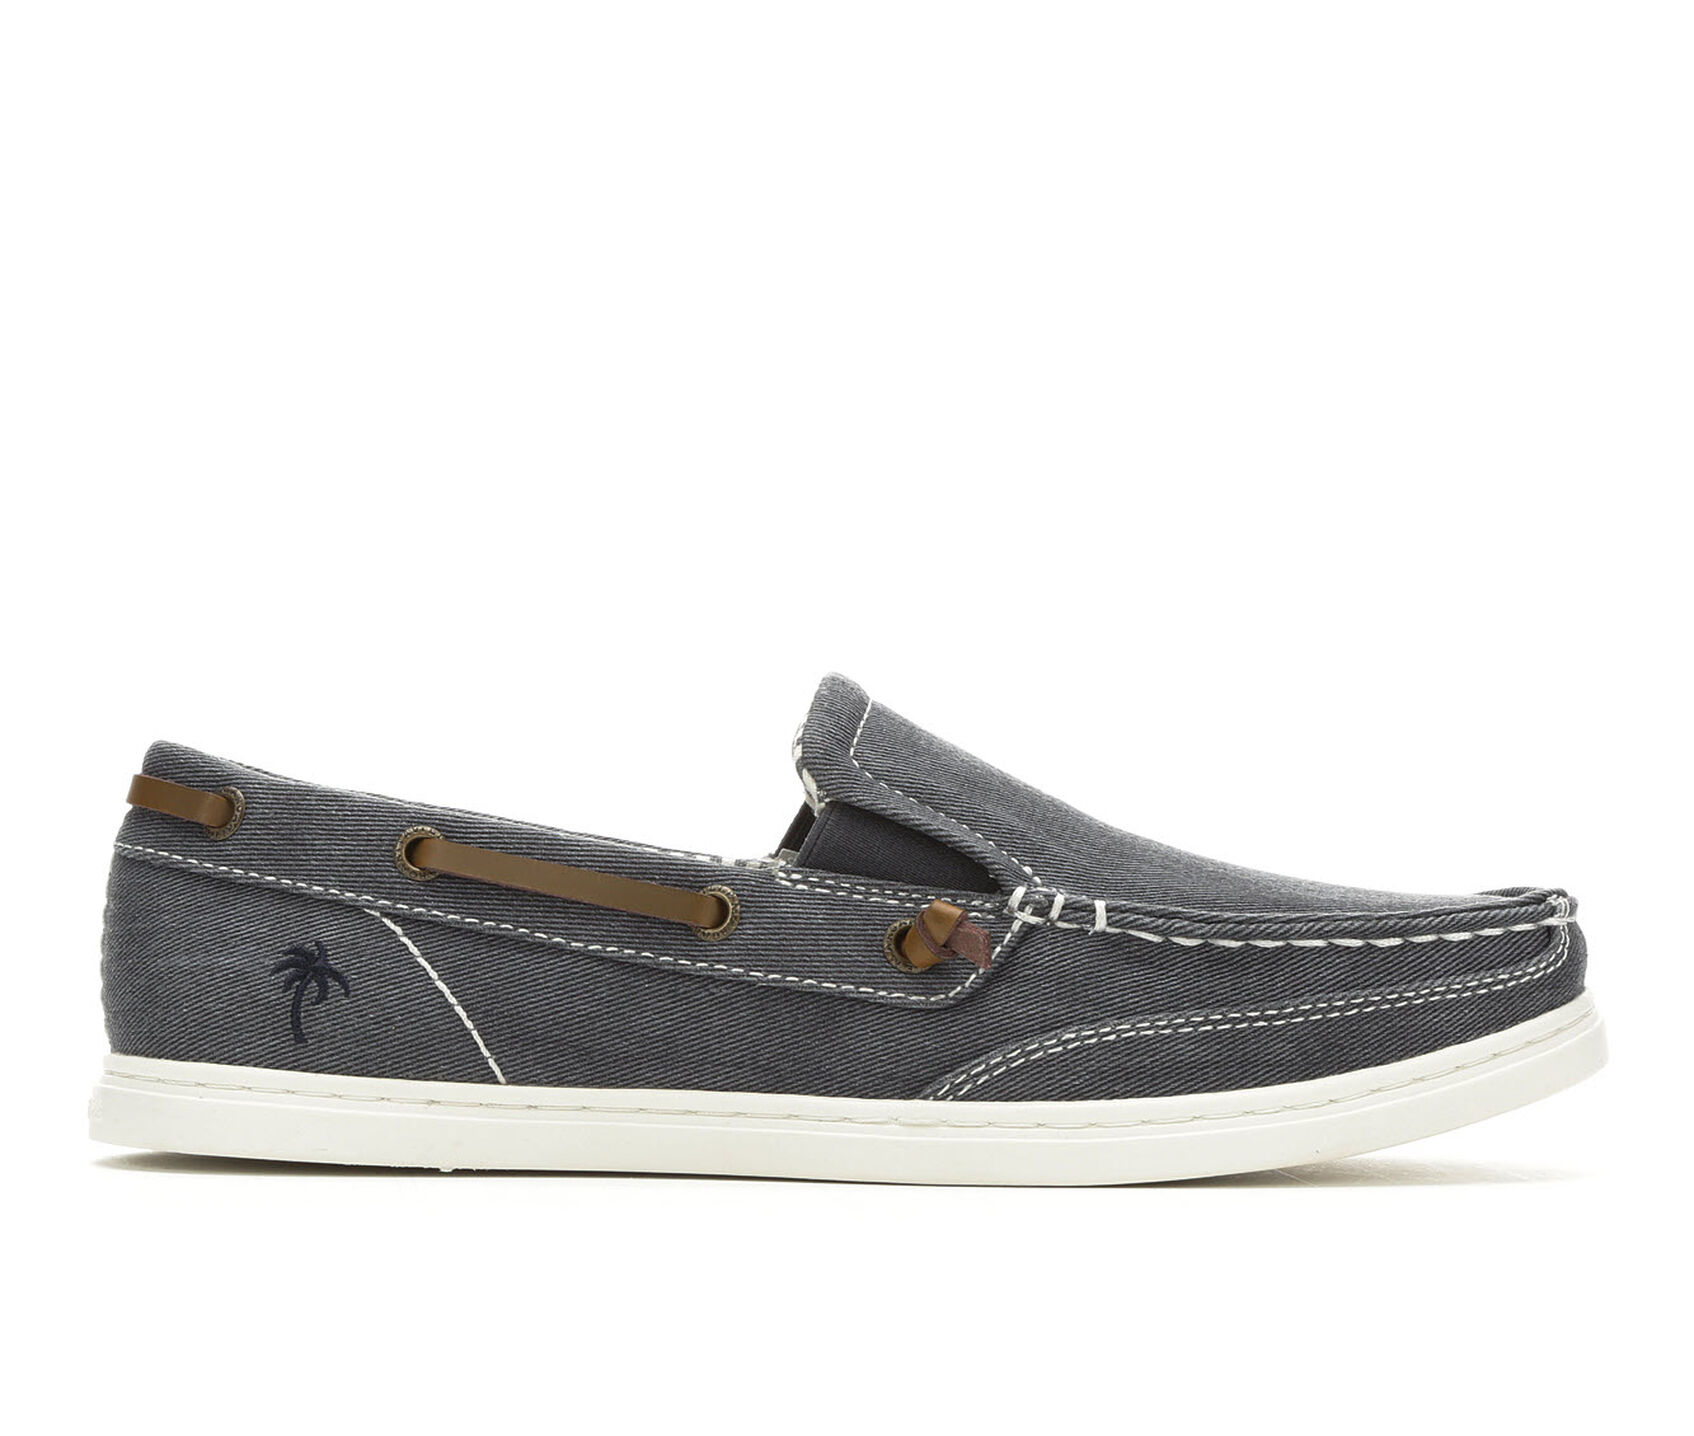 6b3986acb74ab Men's Margaritaville Dock Casual Shoes